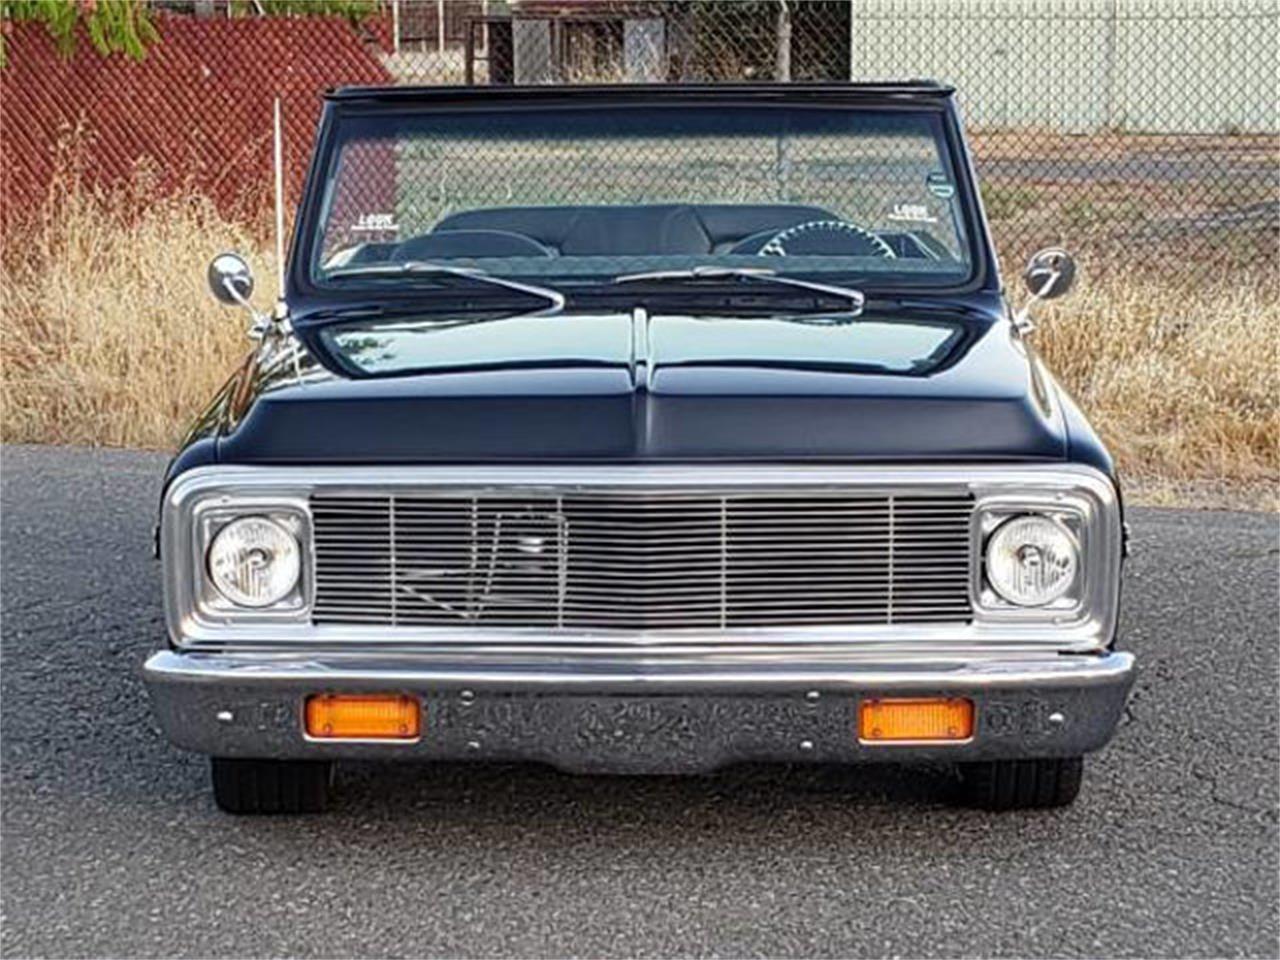 1972 Chevrolet Blazer (CC-1263441) for sale in Long Island, New York